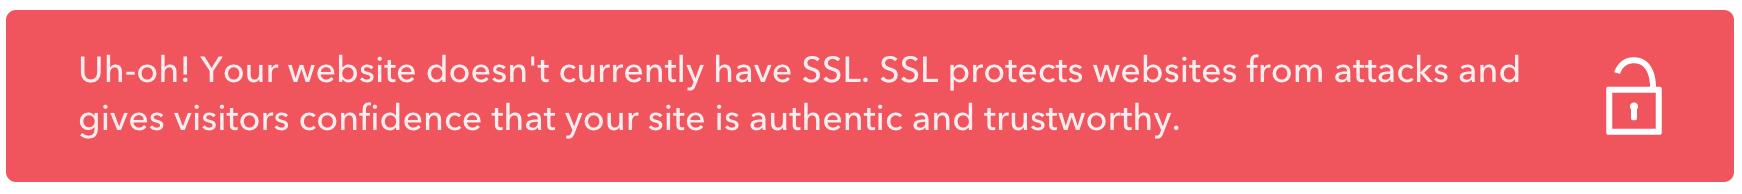 no ssl certificate warning message